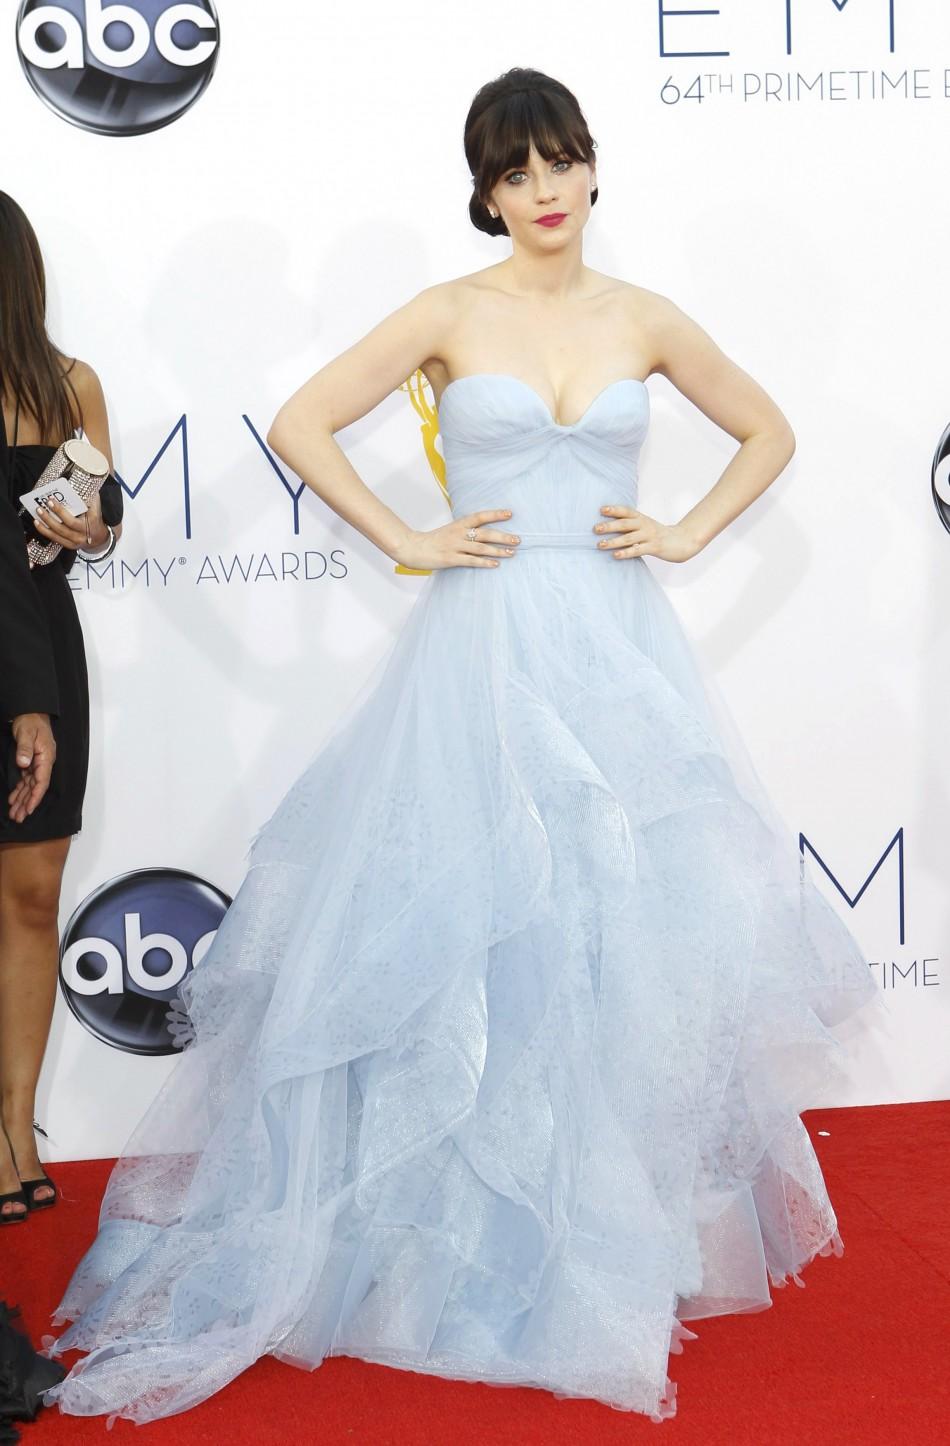 Actress Zooey Deschanel of the comedy series